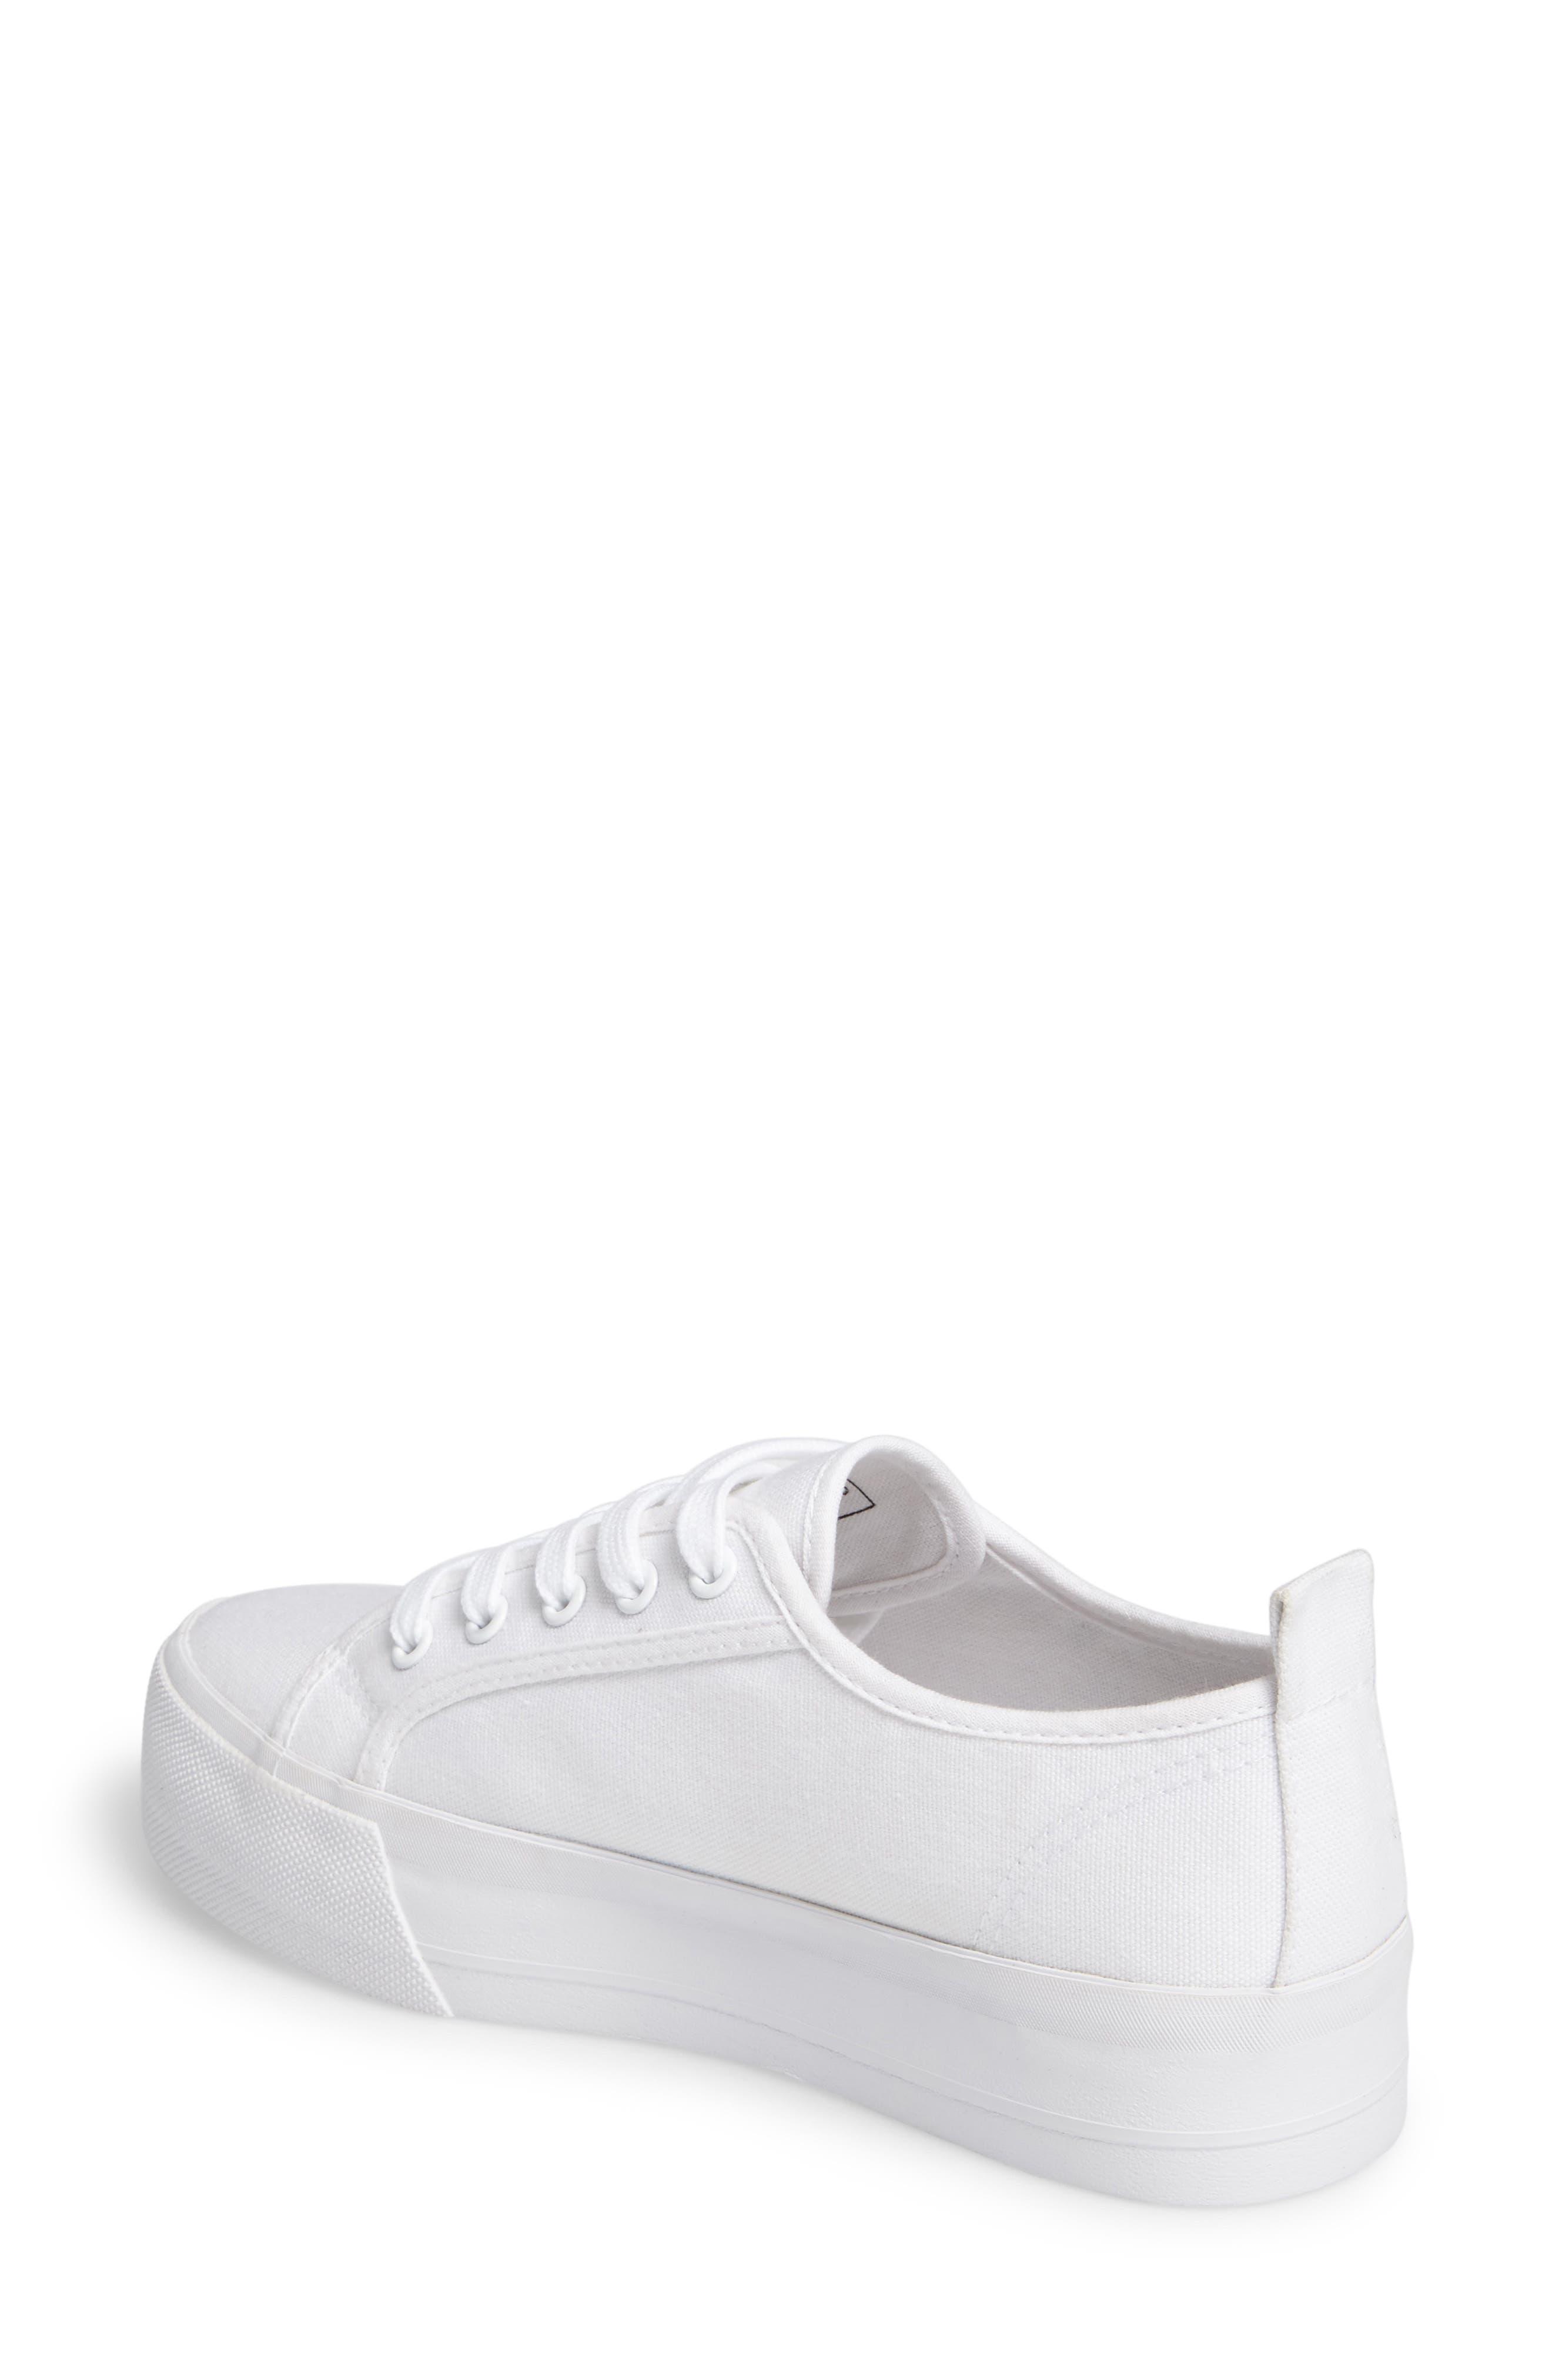 Sneak Platform Sneaker,                             Alternate thumbnail 2, color,                             White Canvas